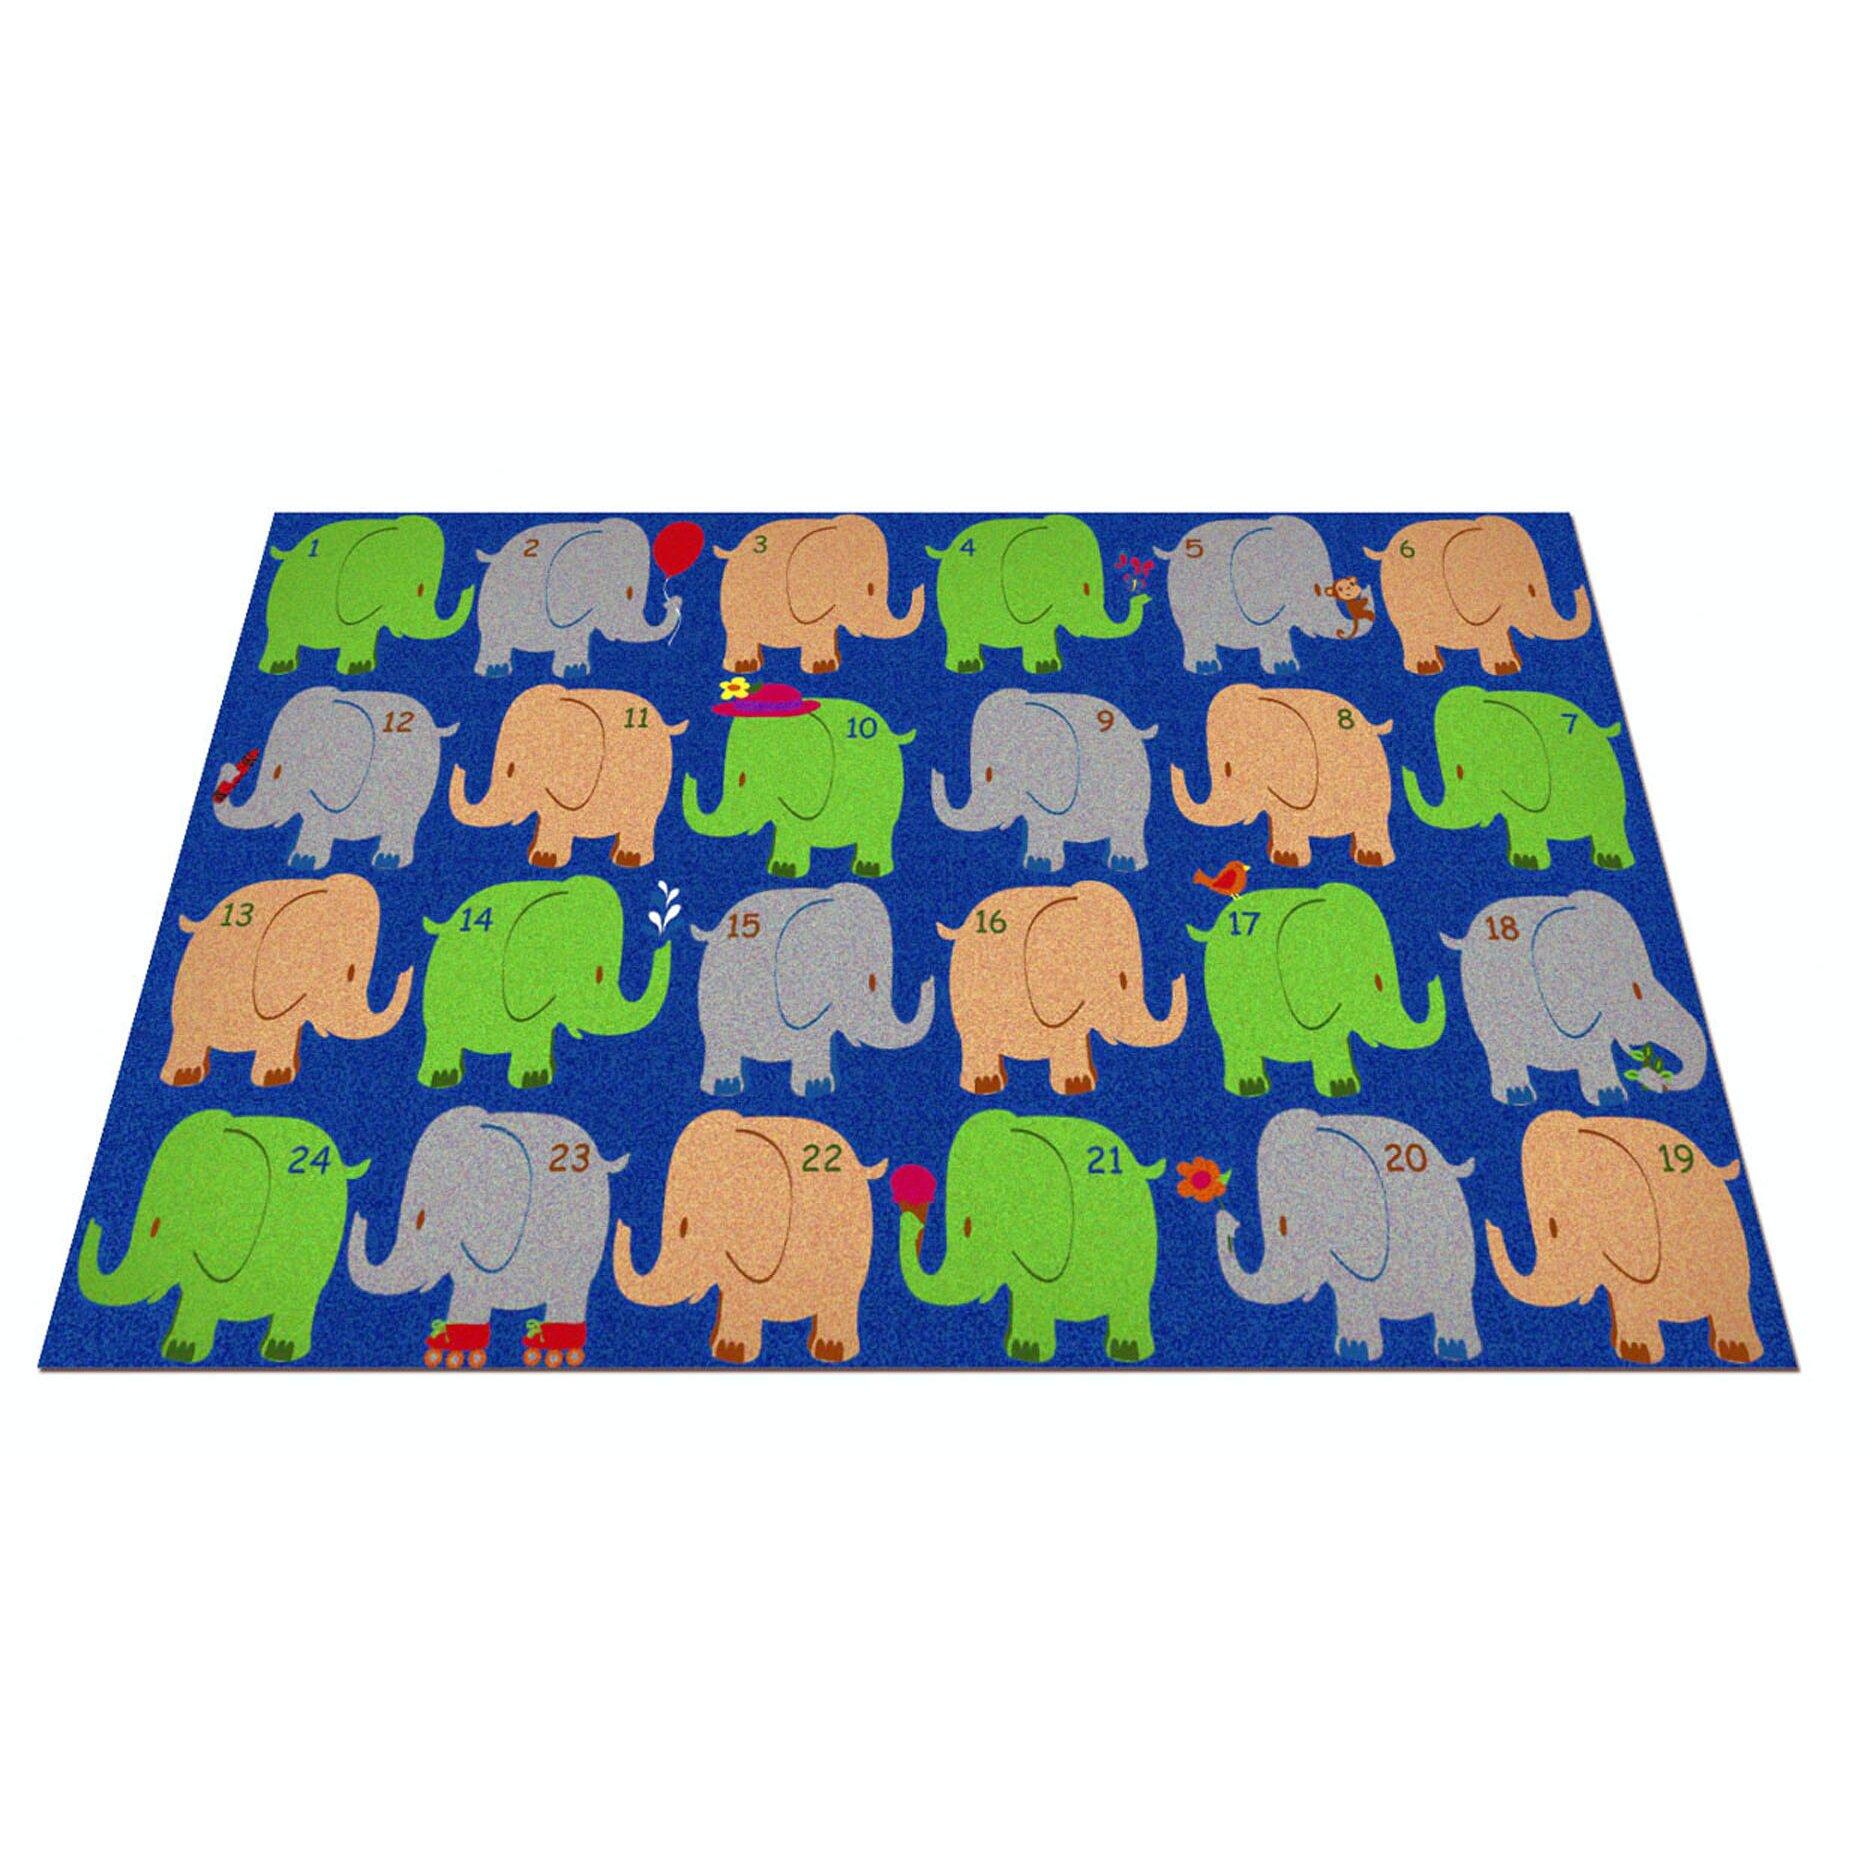 Fun Rugs Fun Time World Map Classroom Area Rug Kid Carpet Elephant Seating  Classroom Area Rug